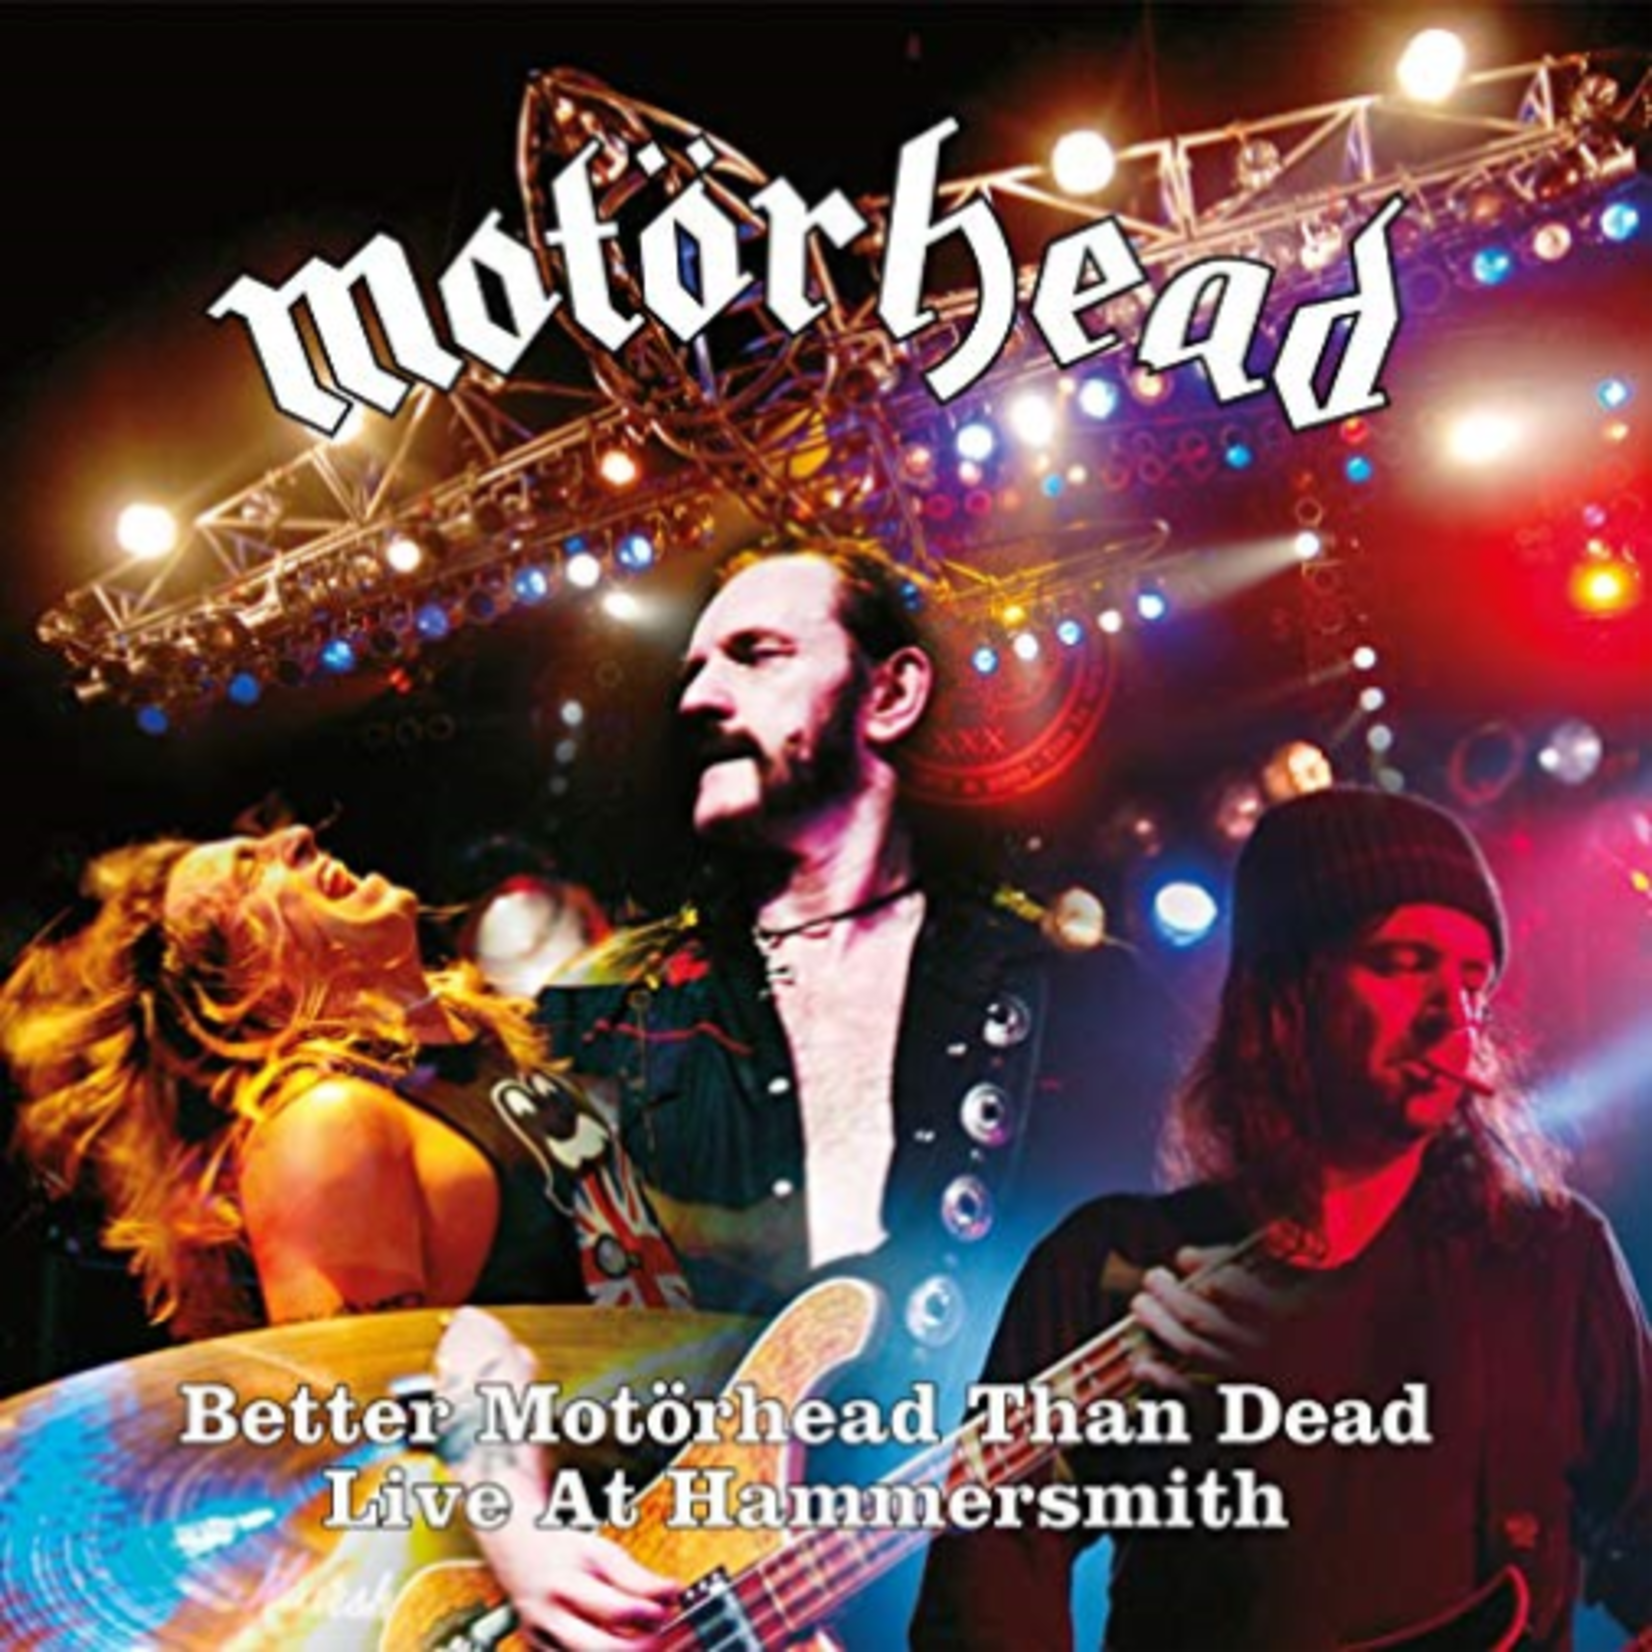 MOTORHEAD BETTER MOTORHEAD THAN DEAD (LIVE AT HAMMERSMITH) (LP)